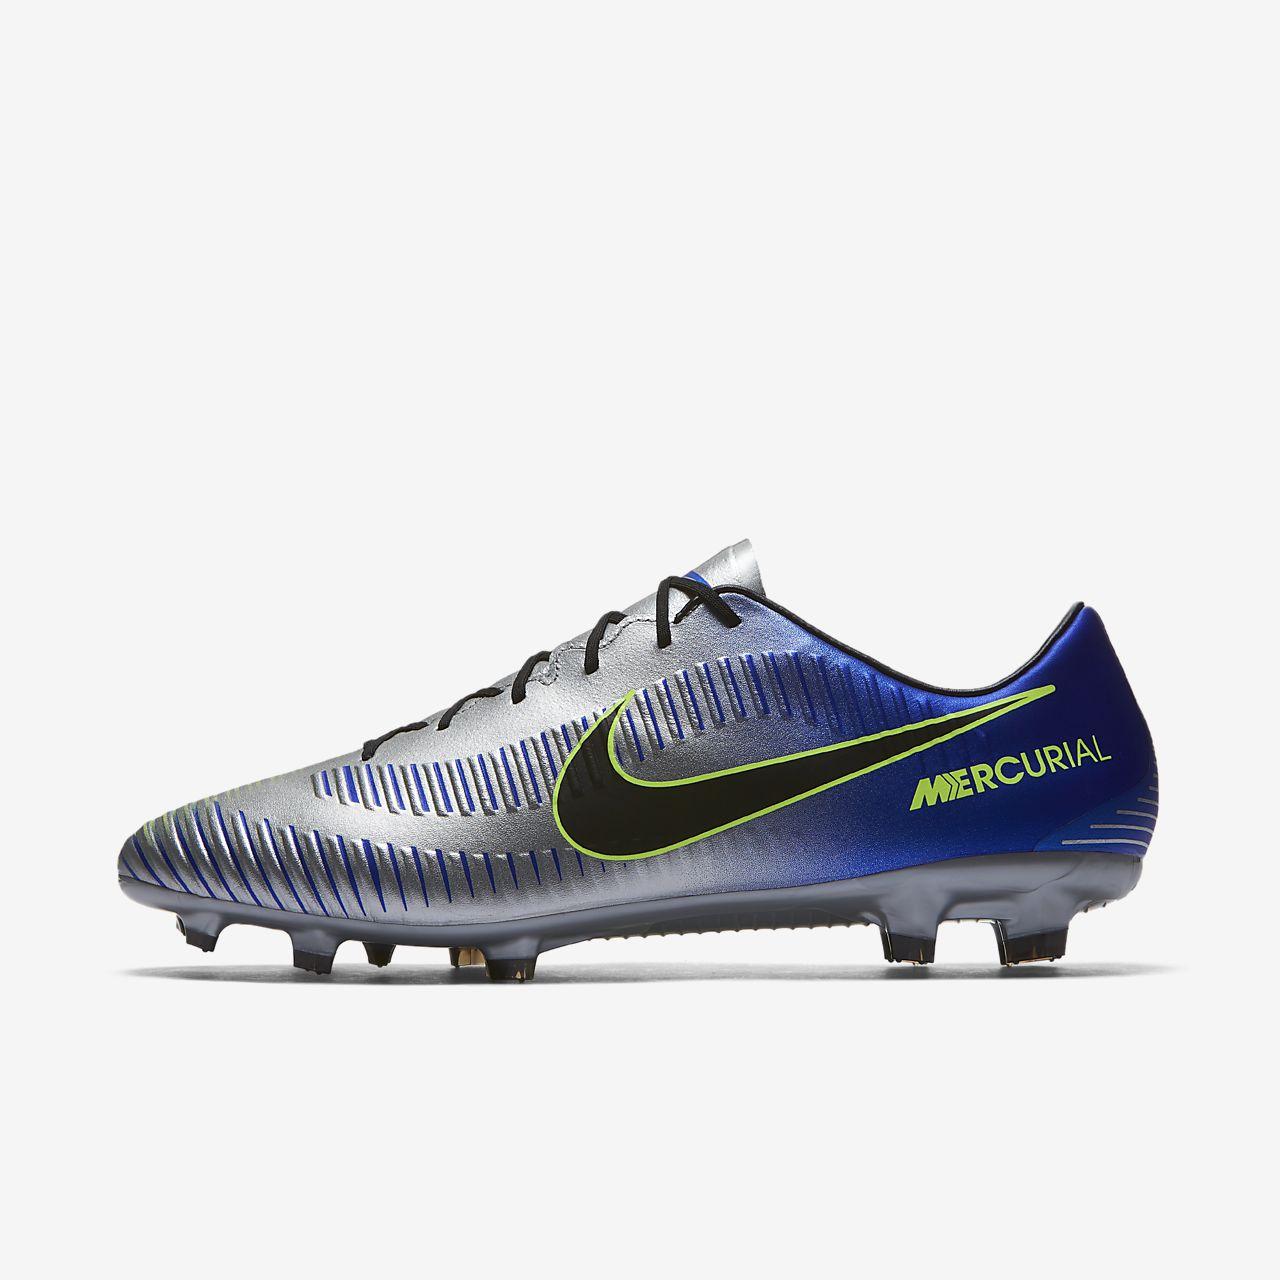 Nike Mercuriel Veloce Iii Football 8vvezKgsEn